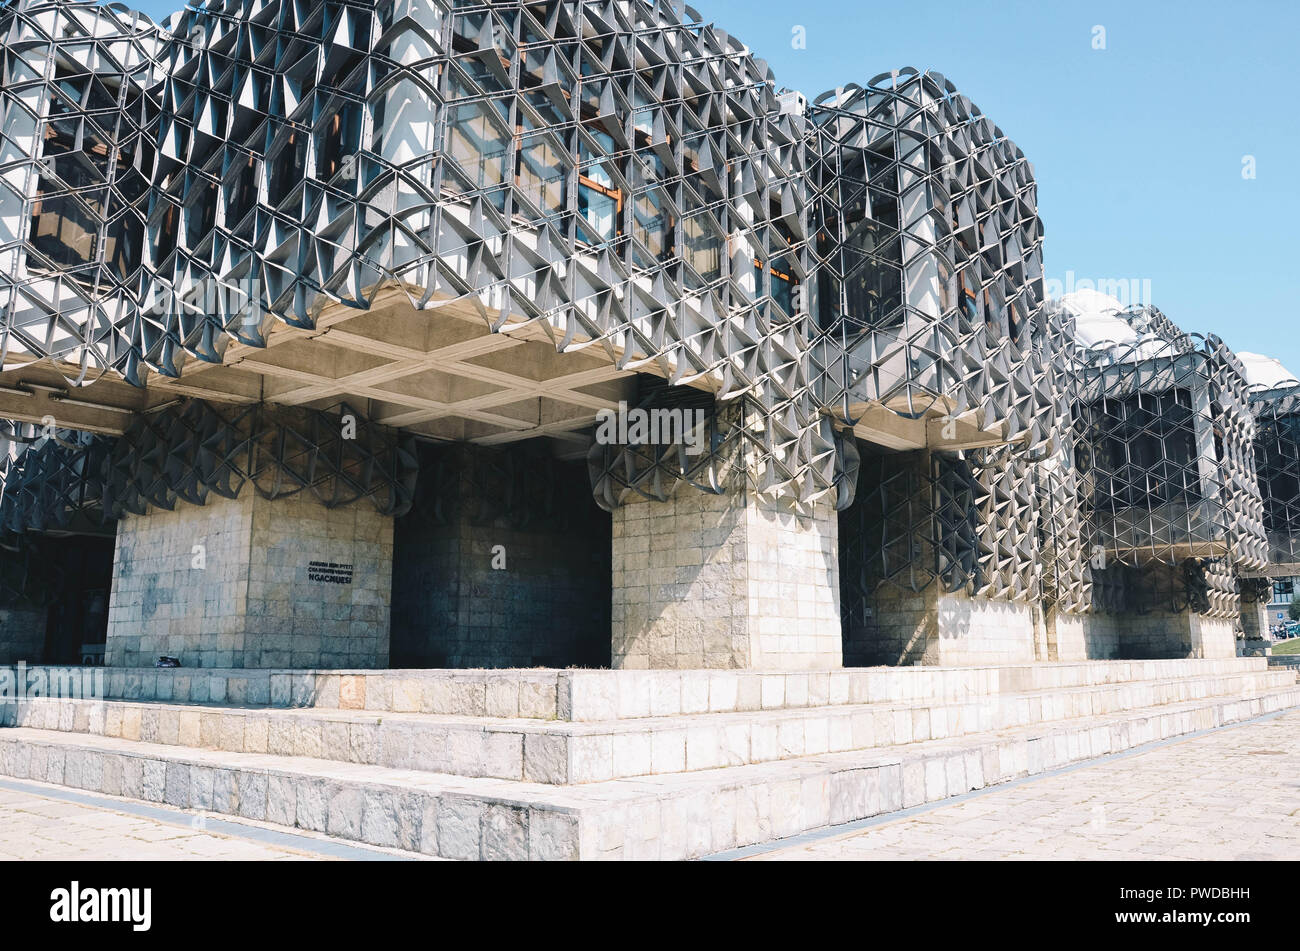 National Library of Kosovo (by Andrija Mutnjaković), Pristina, Kosovo, Balkans, September 2018 - Stock Image